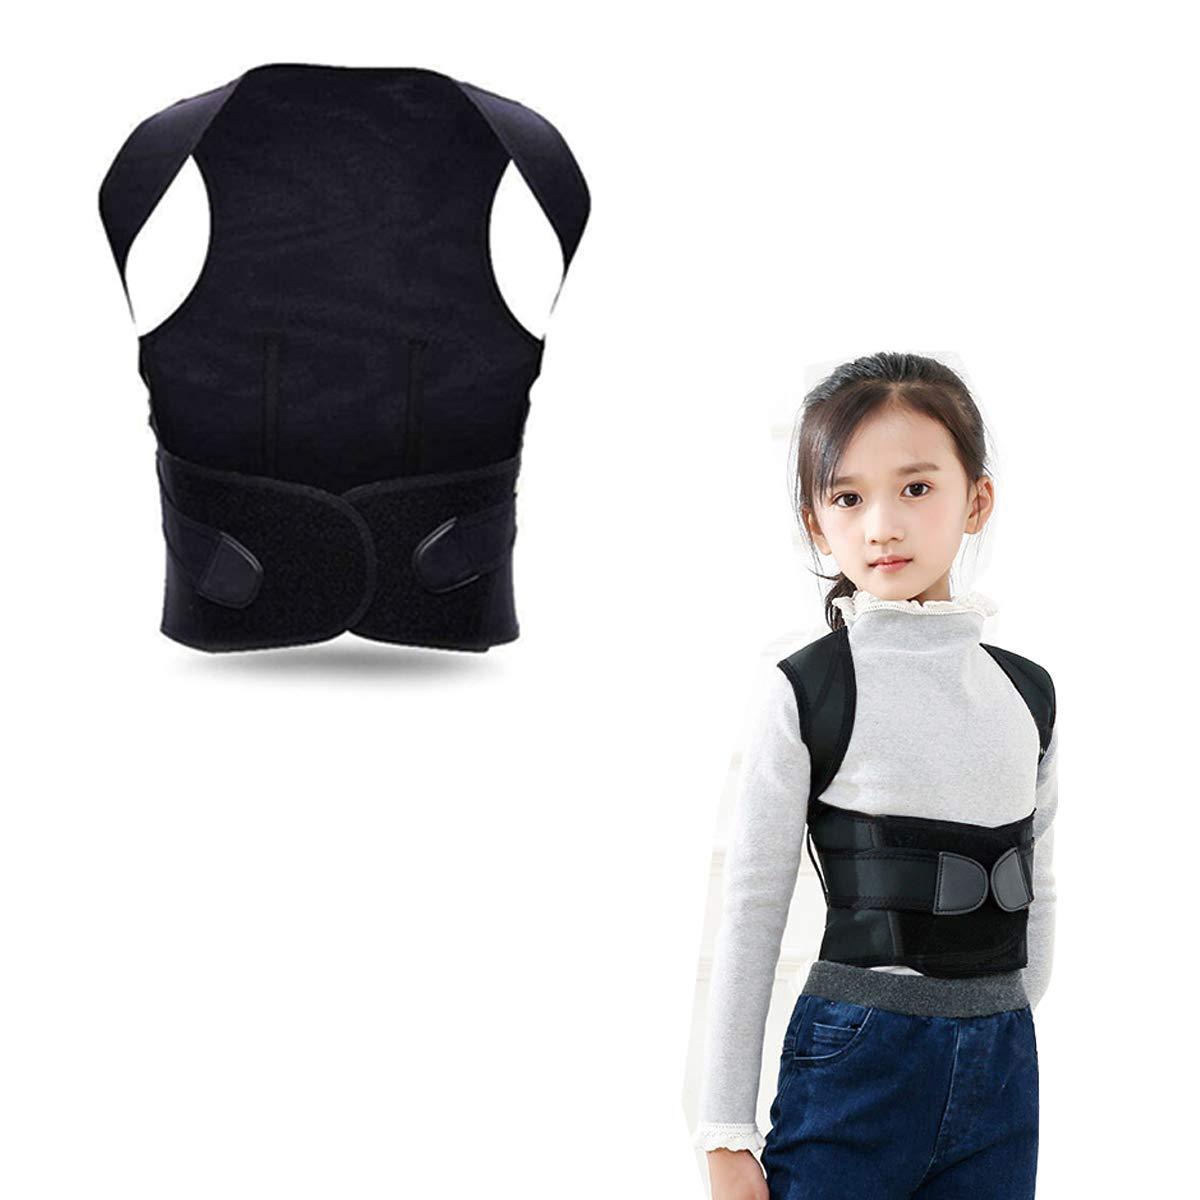 S2530 MEILEZI Back Posture Corrector, Posture Corrector for Women and Kids Men